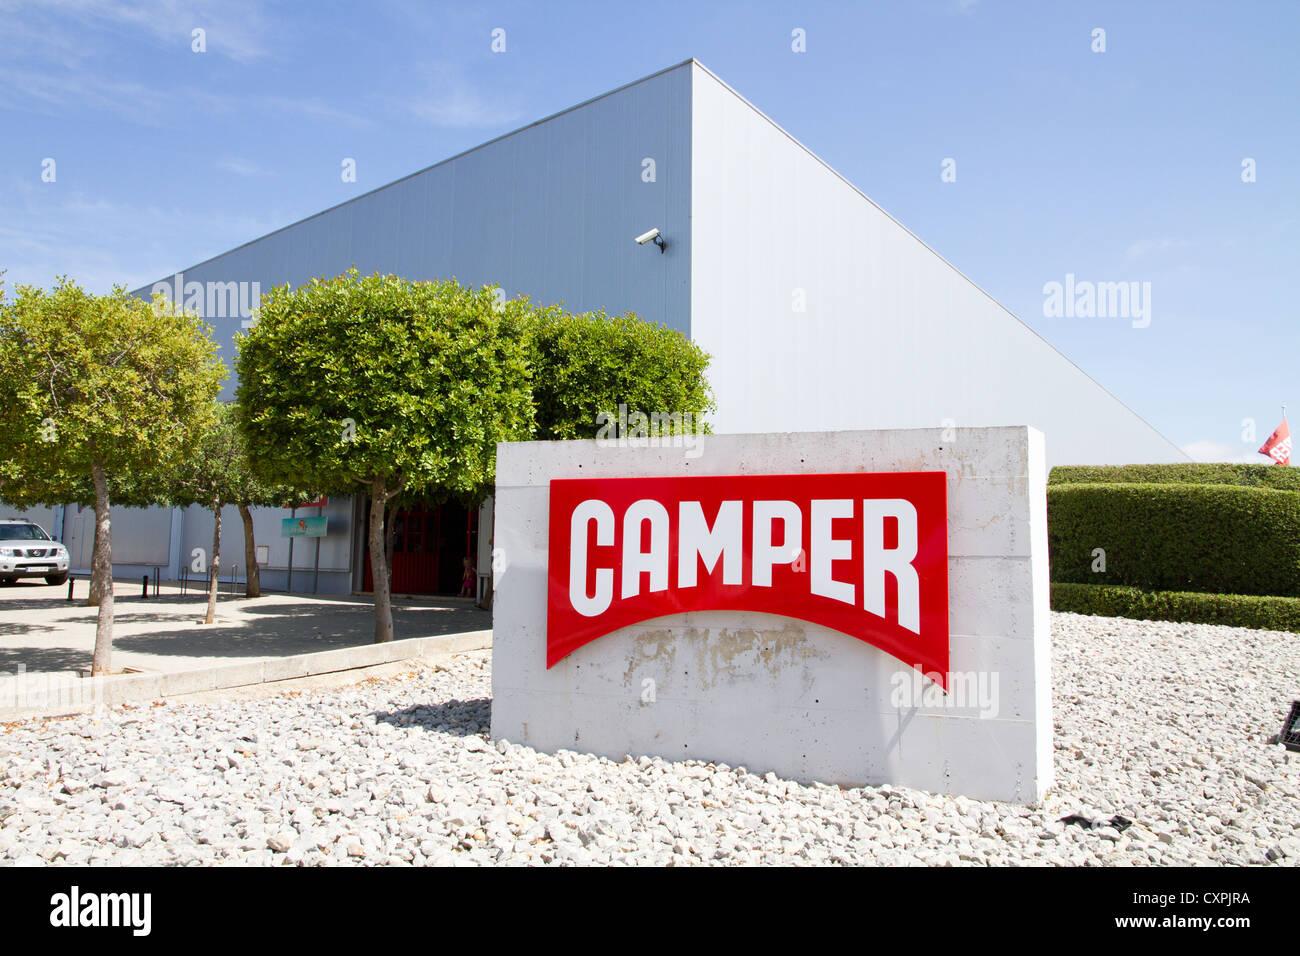 Alamy Shoes amp; Images Photos Camper qzXB6xFKw